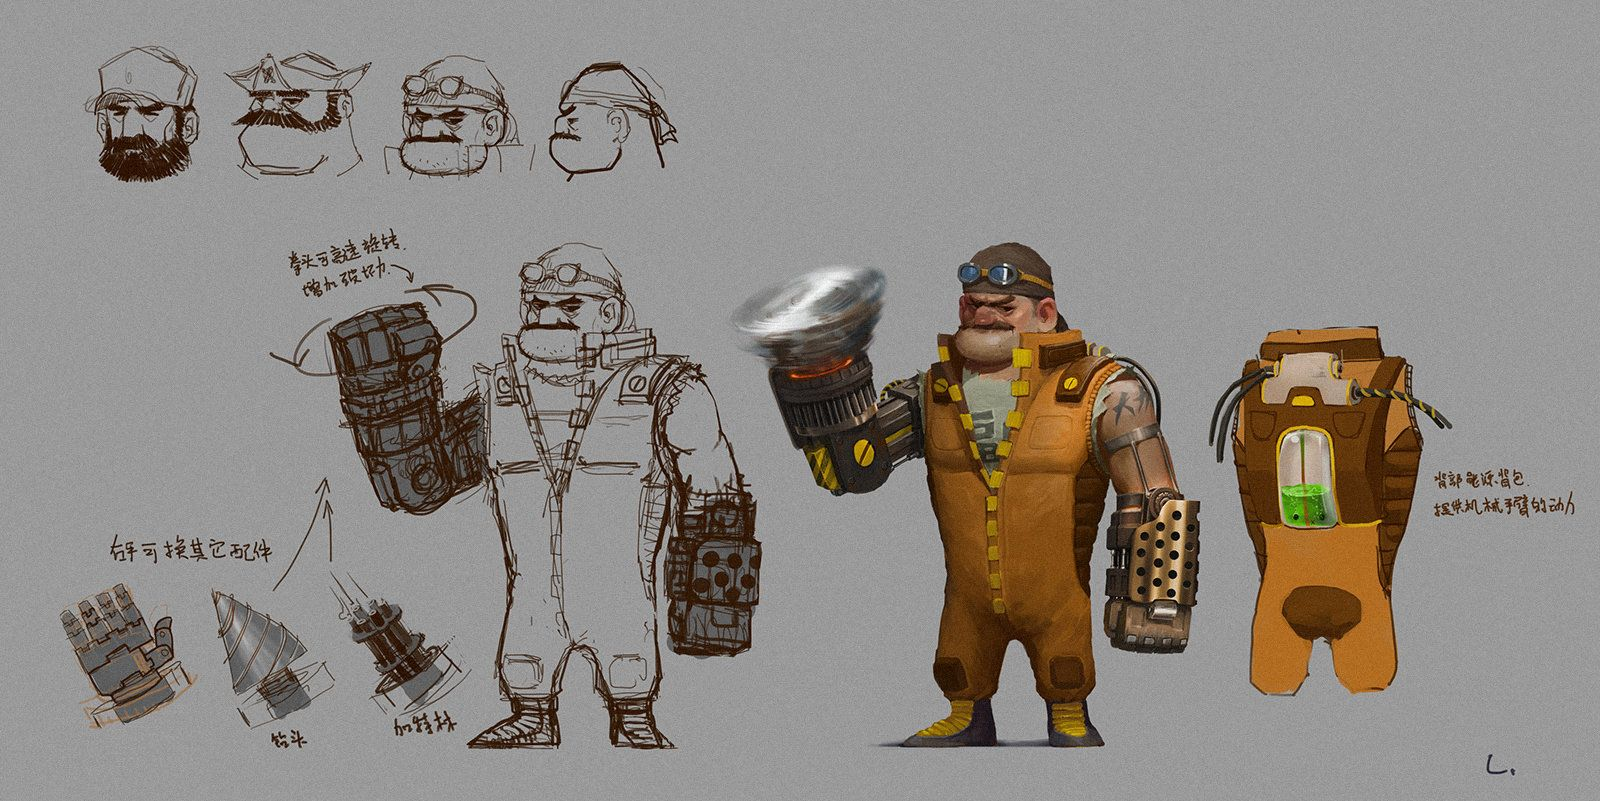 ArtStation - character design, yuting li